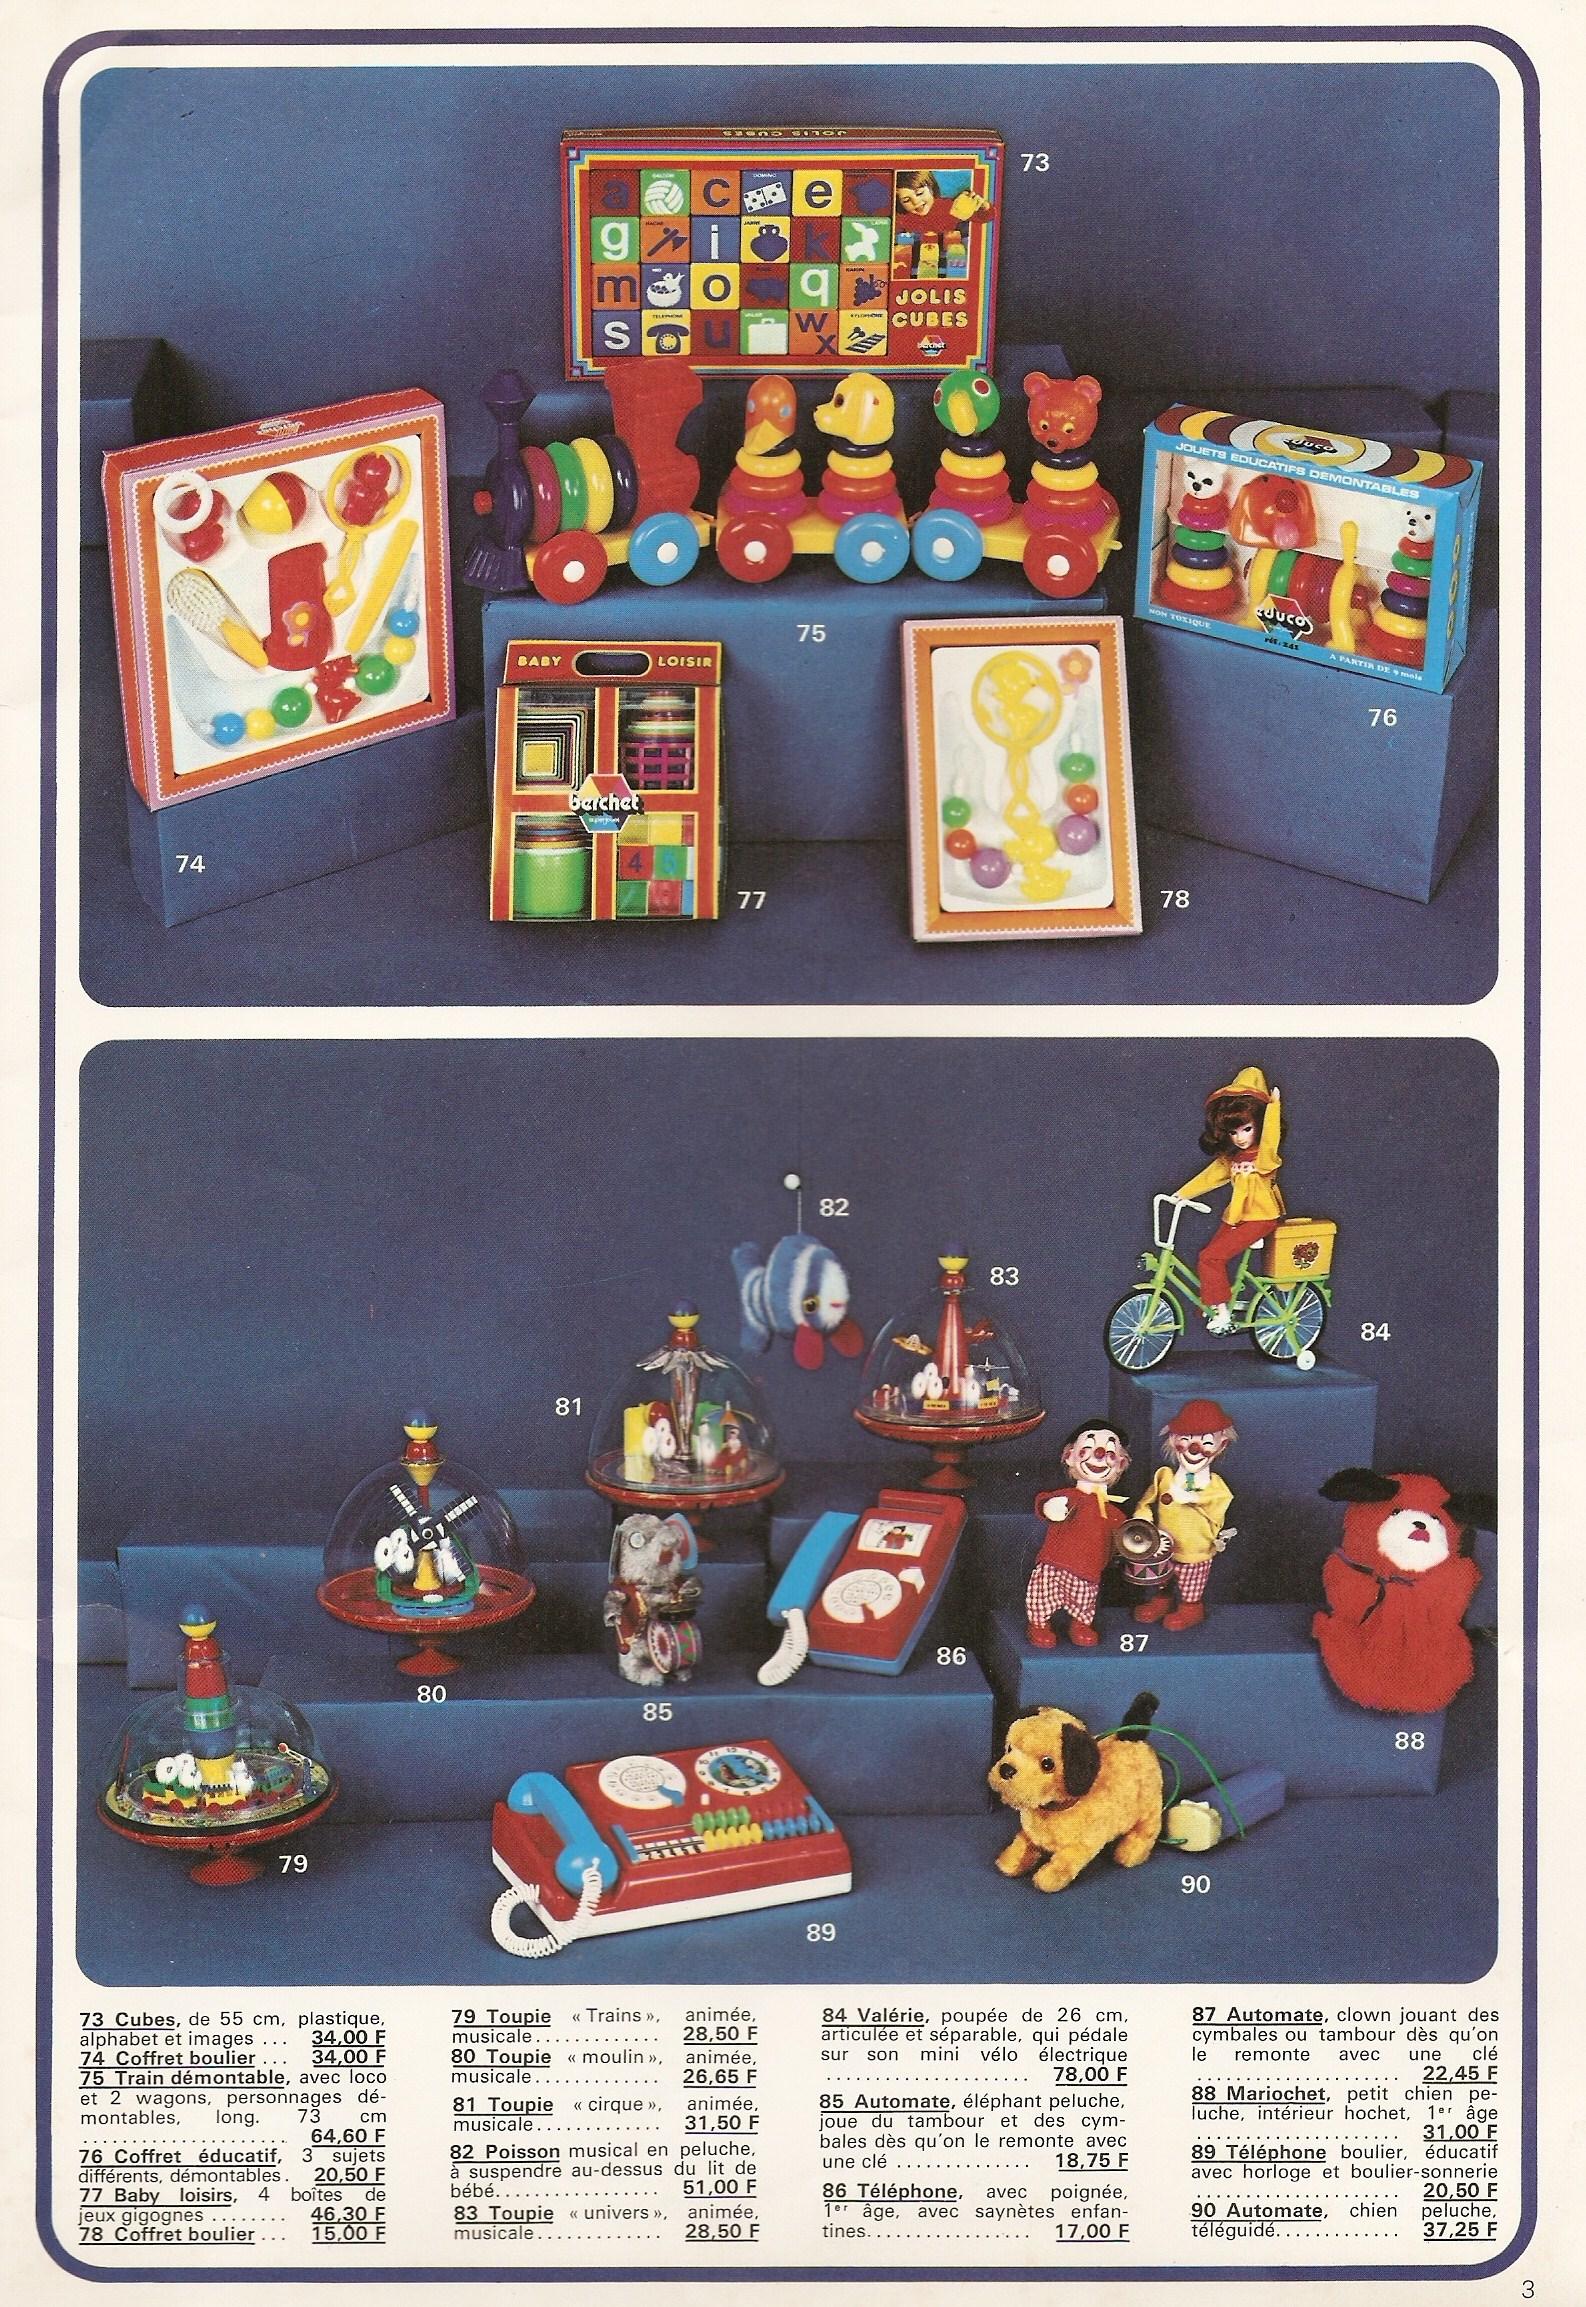 France Promo Promo Catalogue France 1975 Catalogue Jouets 5cjqA34RL